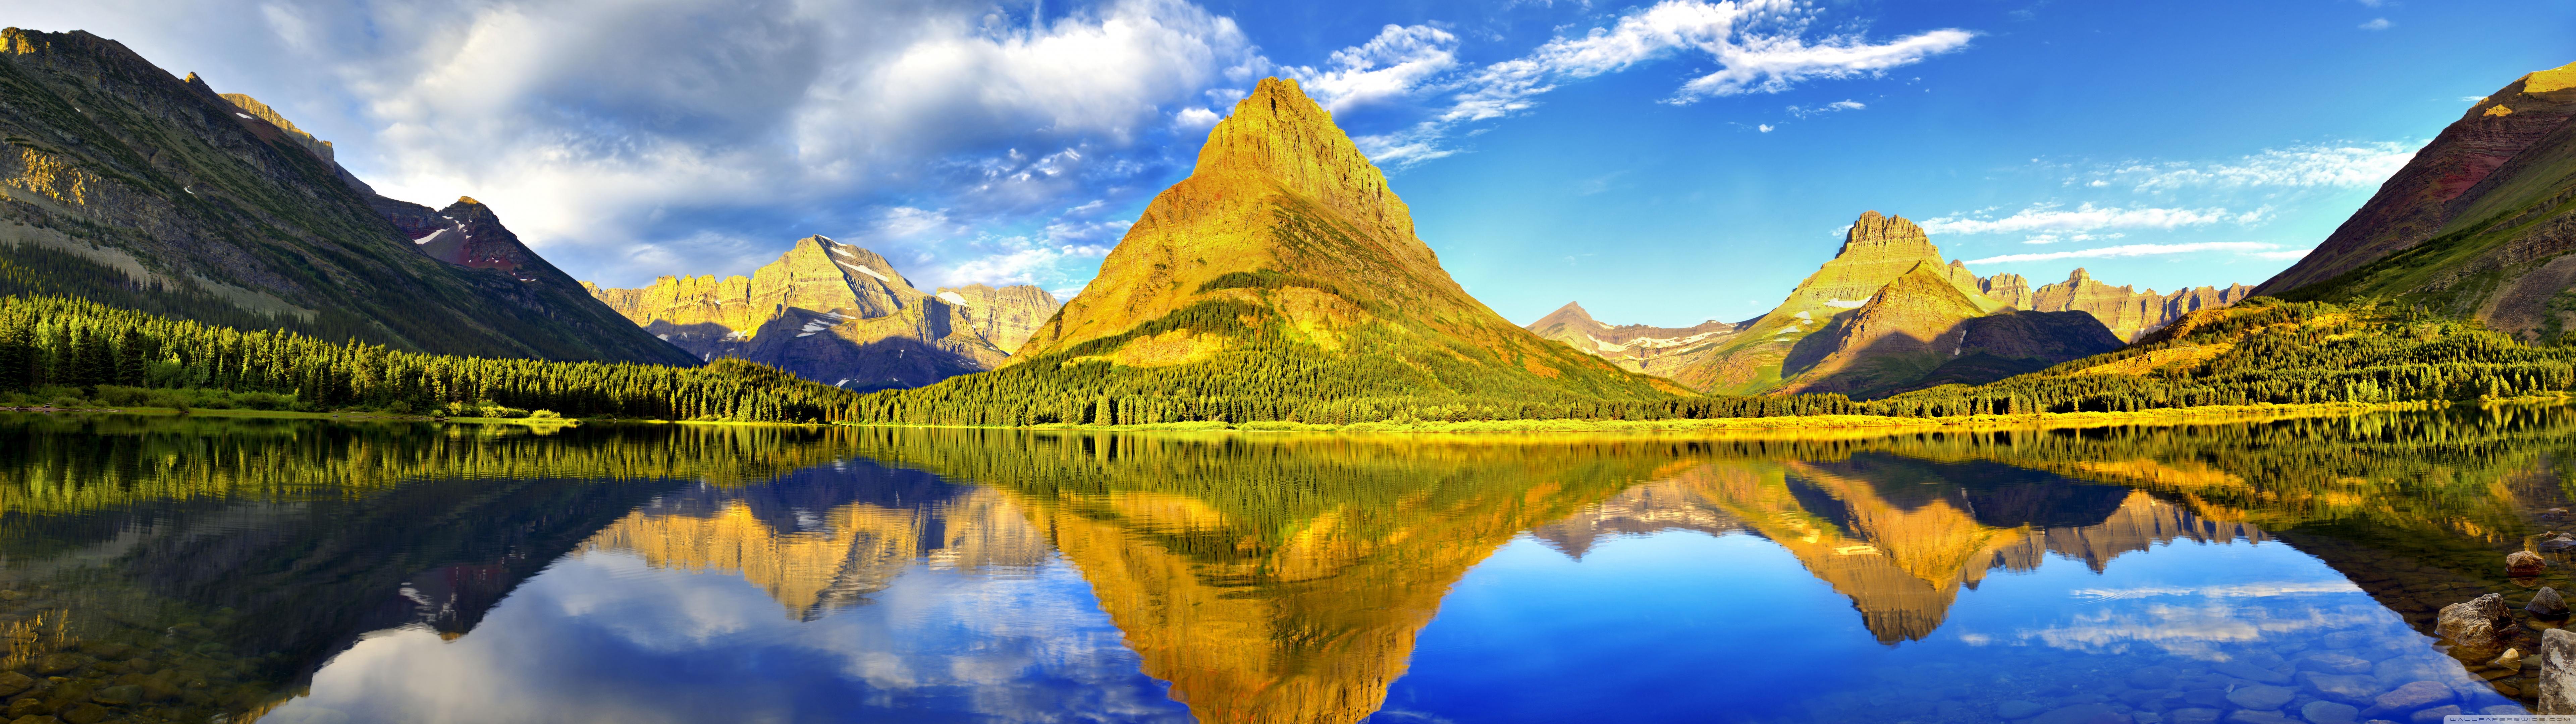 National Park Panorama Wallpaper 76802160 161484 HD Wallpaper 7680x2160